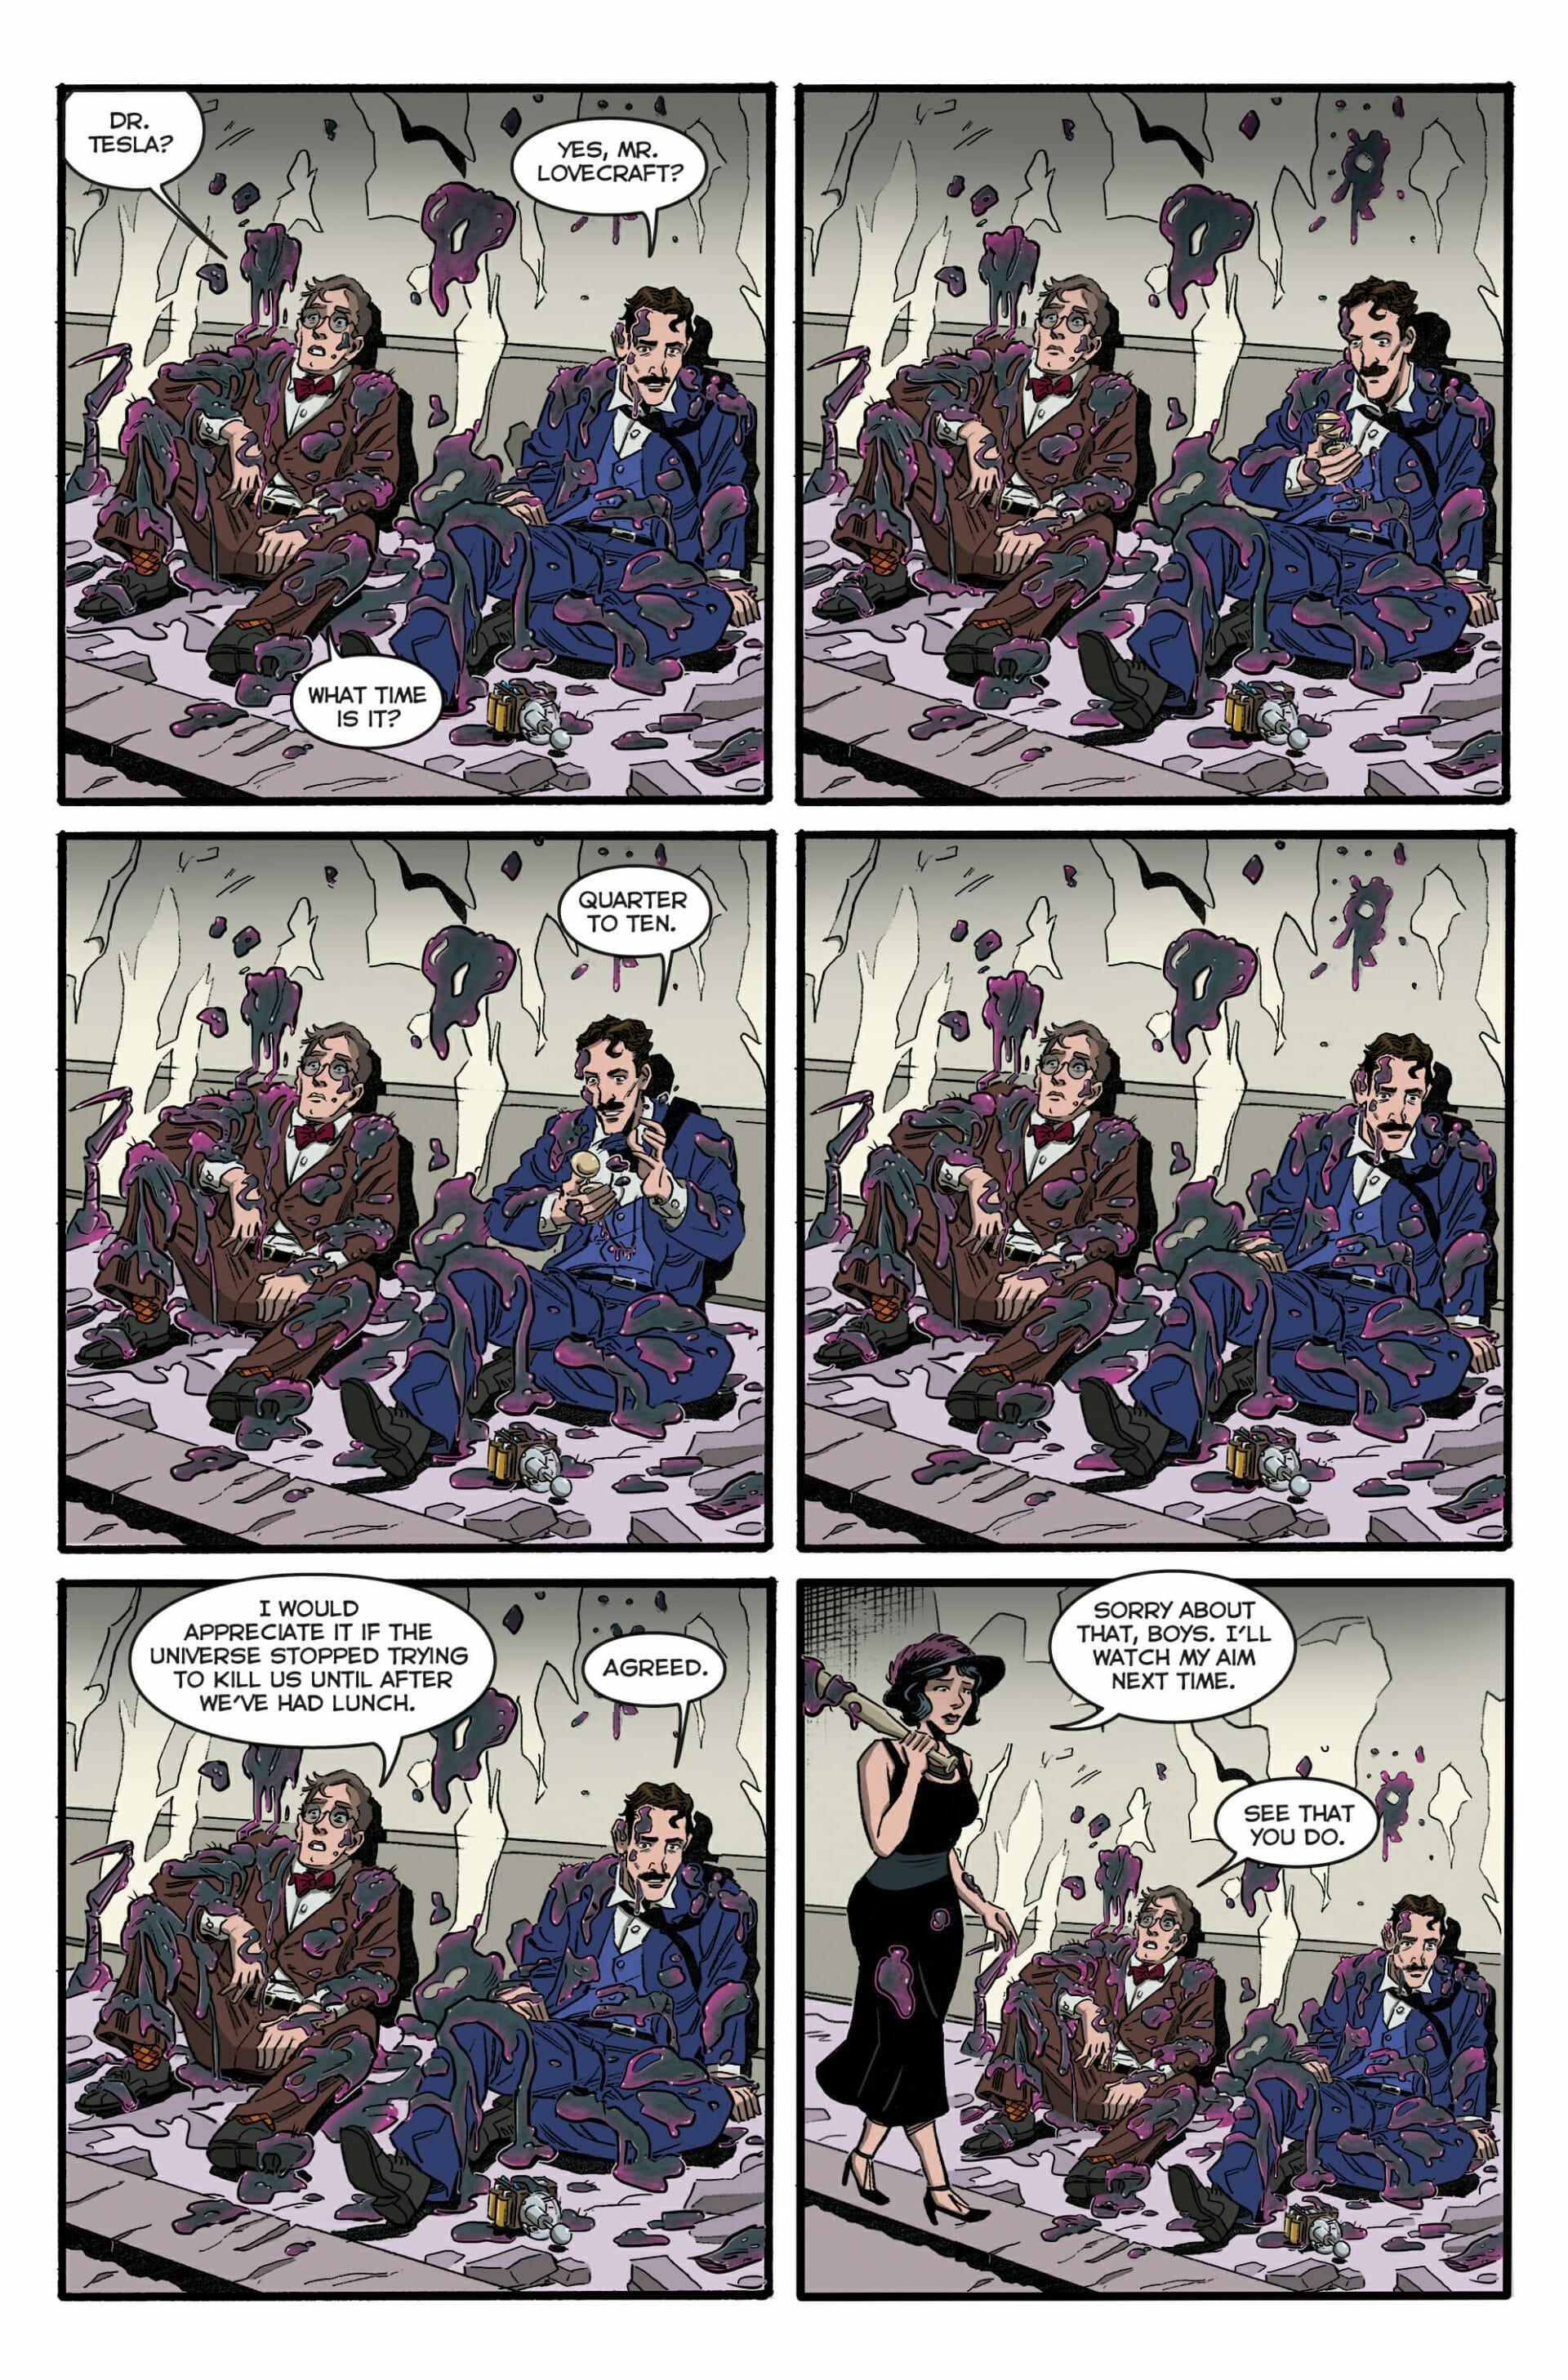 Lovecraft & Tesla - Bundles of Joy